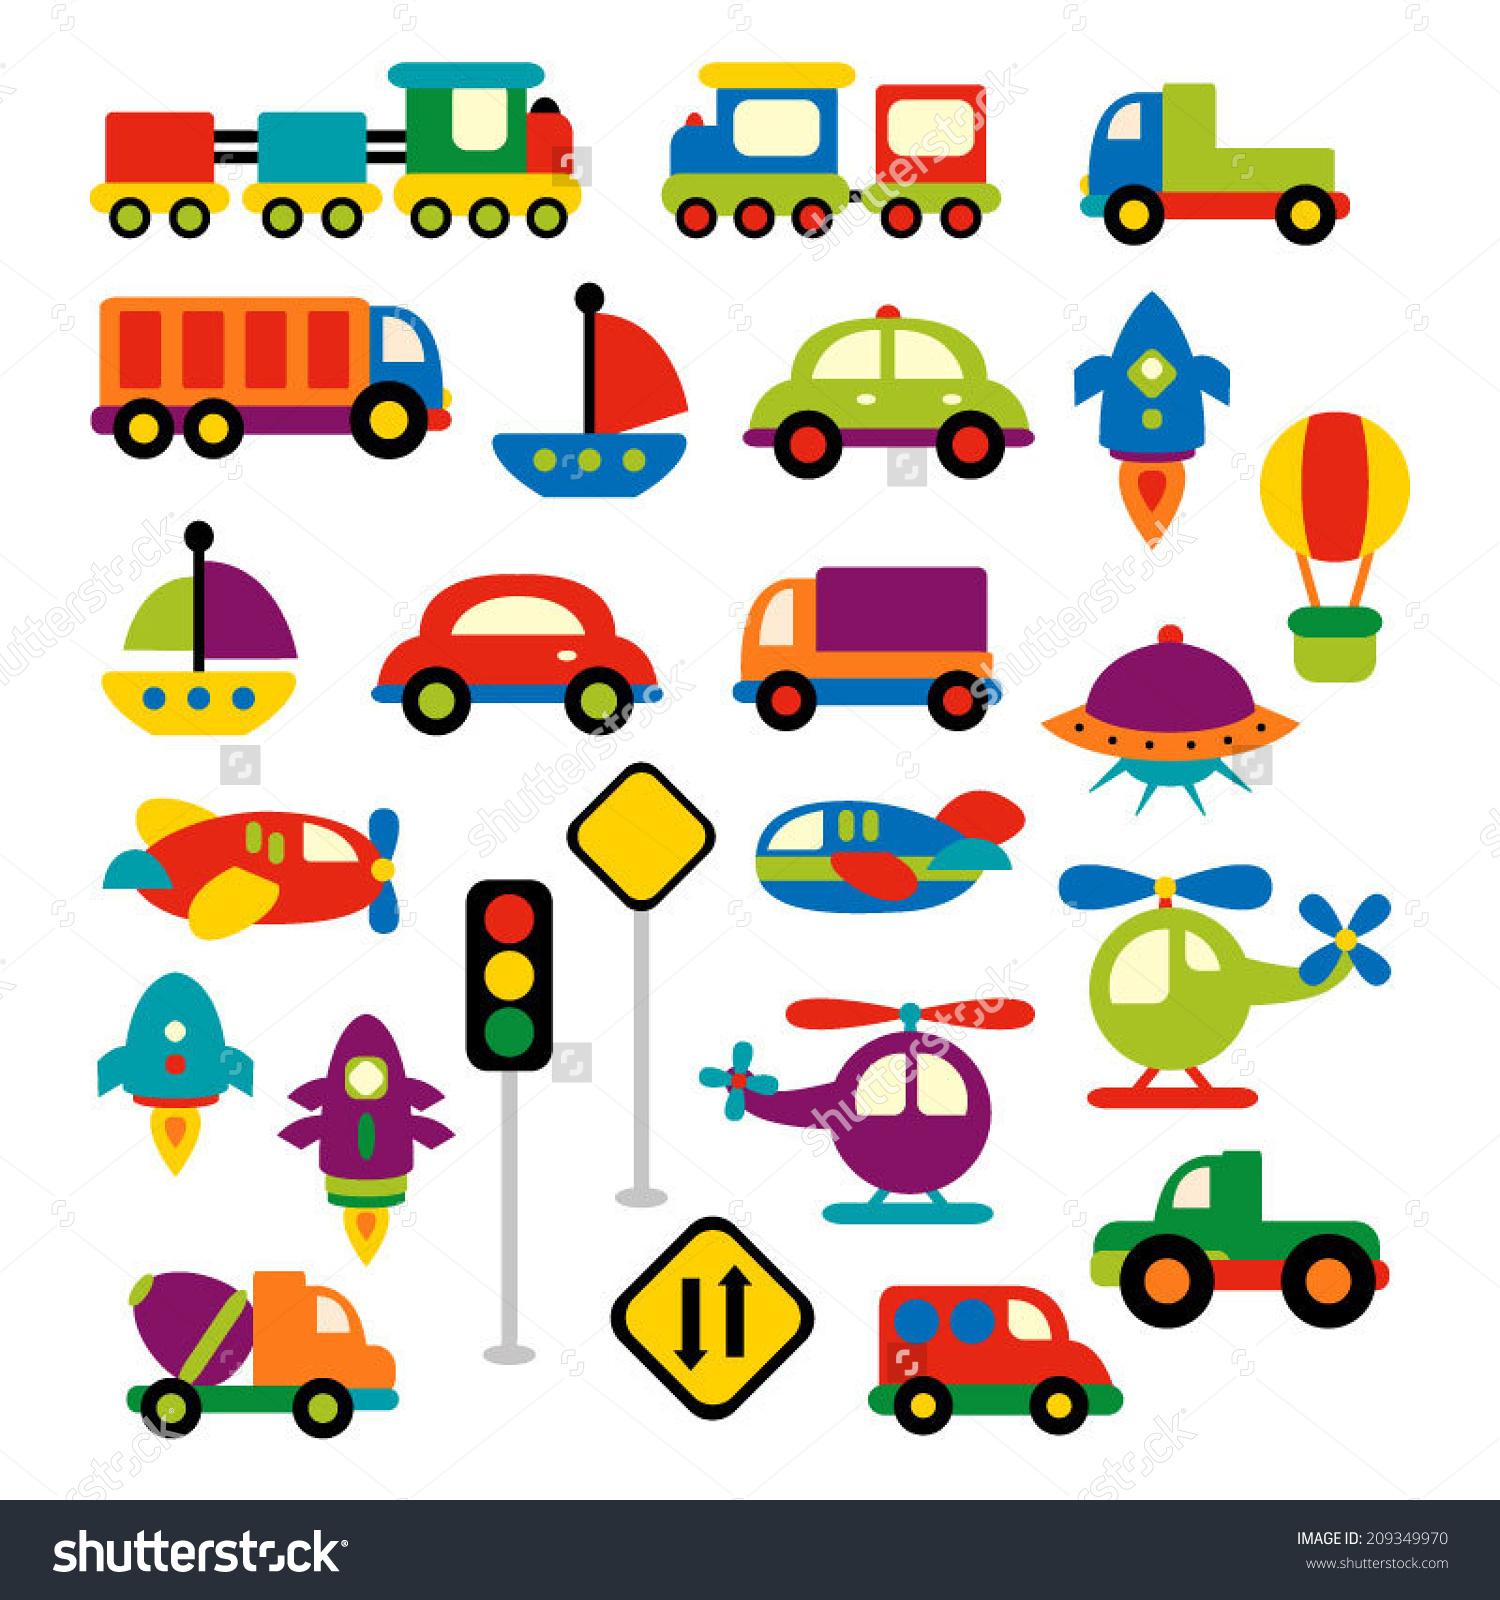 Transportation vector clip art in bright colors. Trains, trucks, cars, boat,